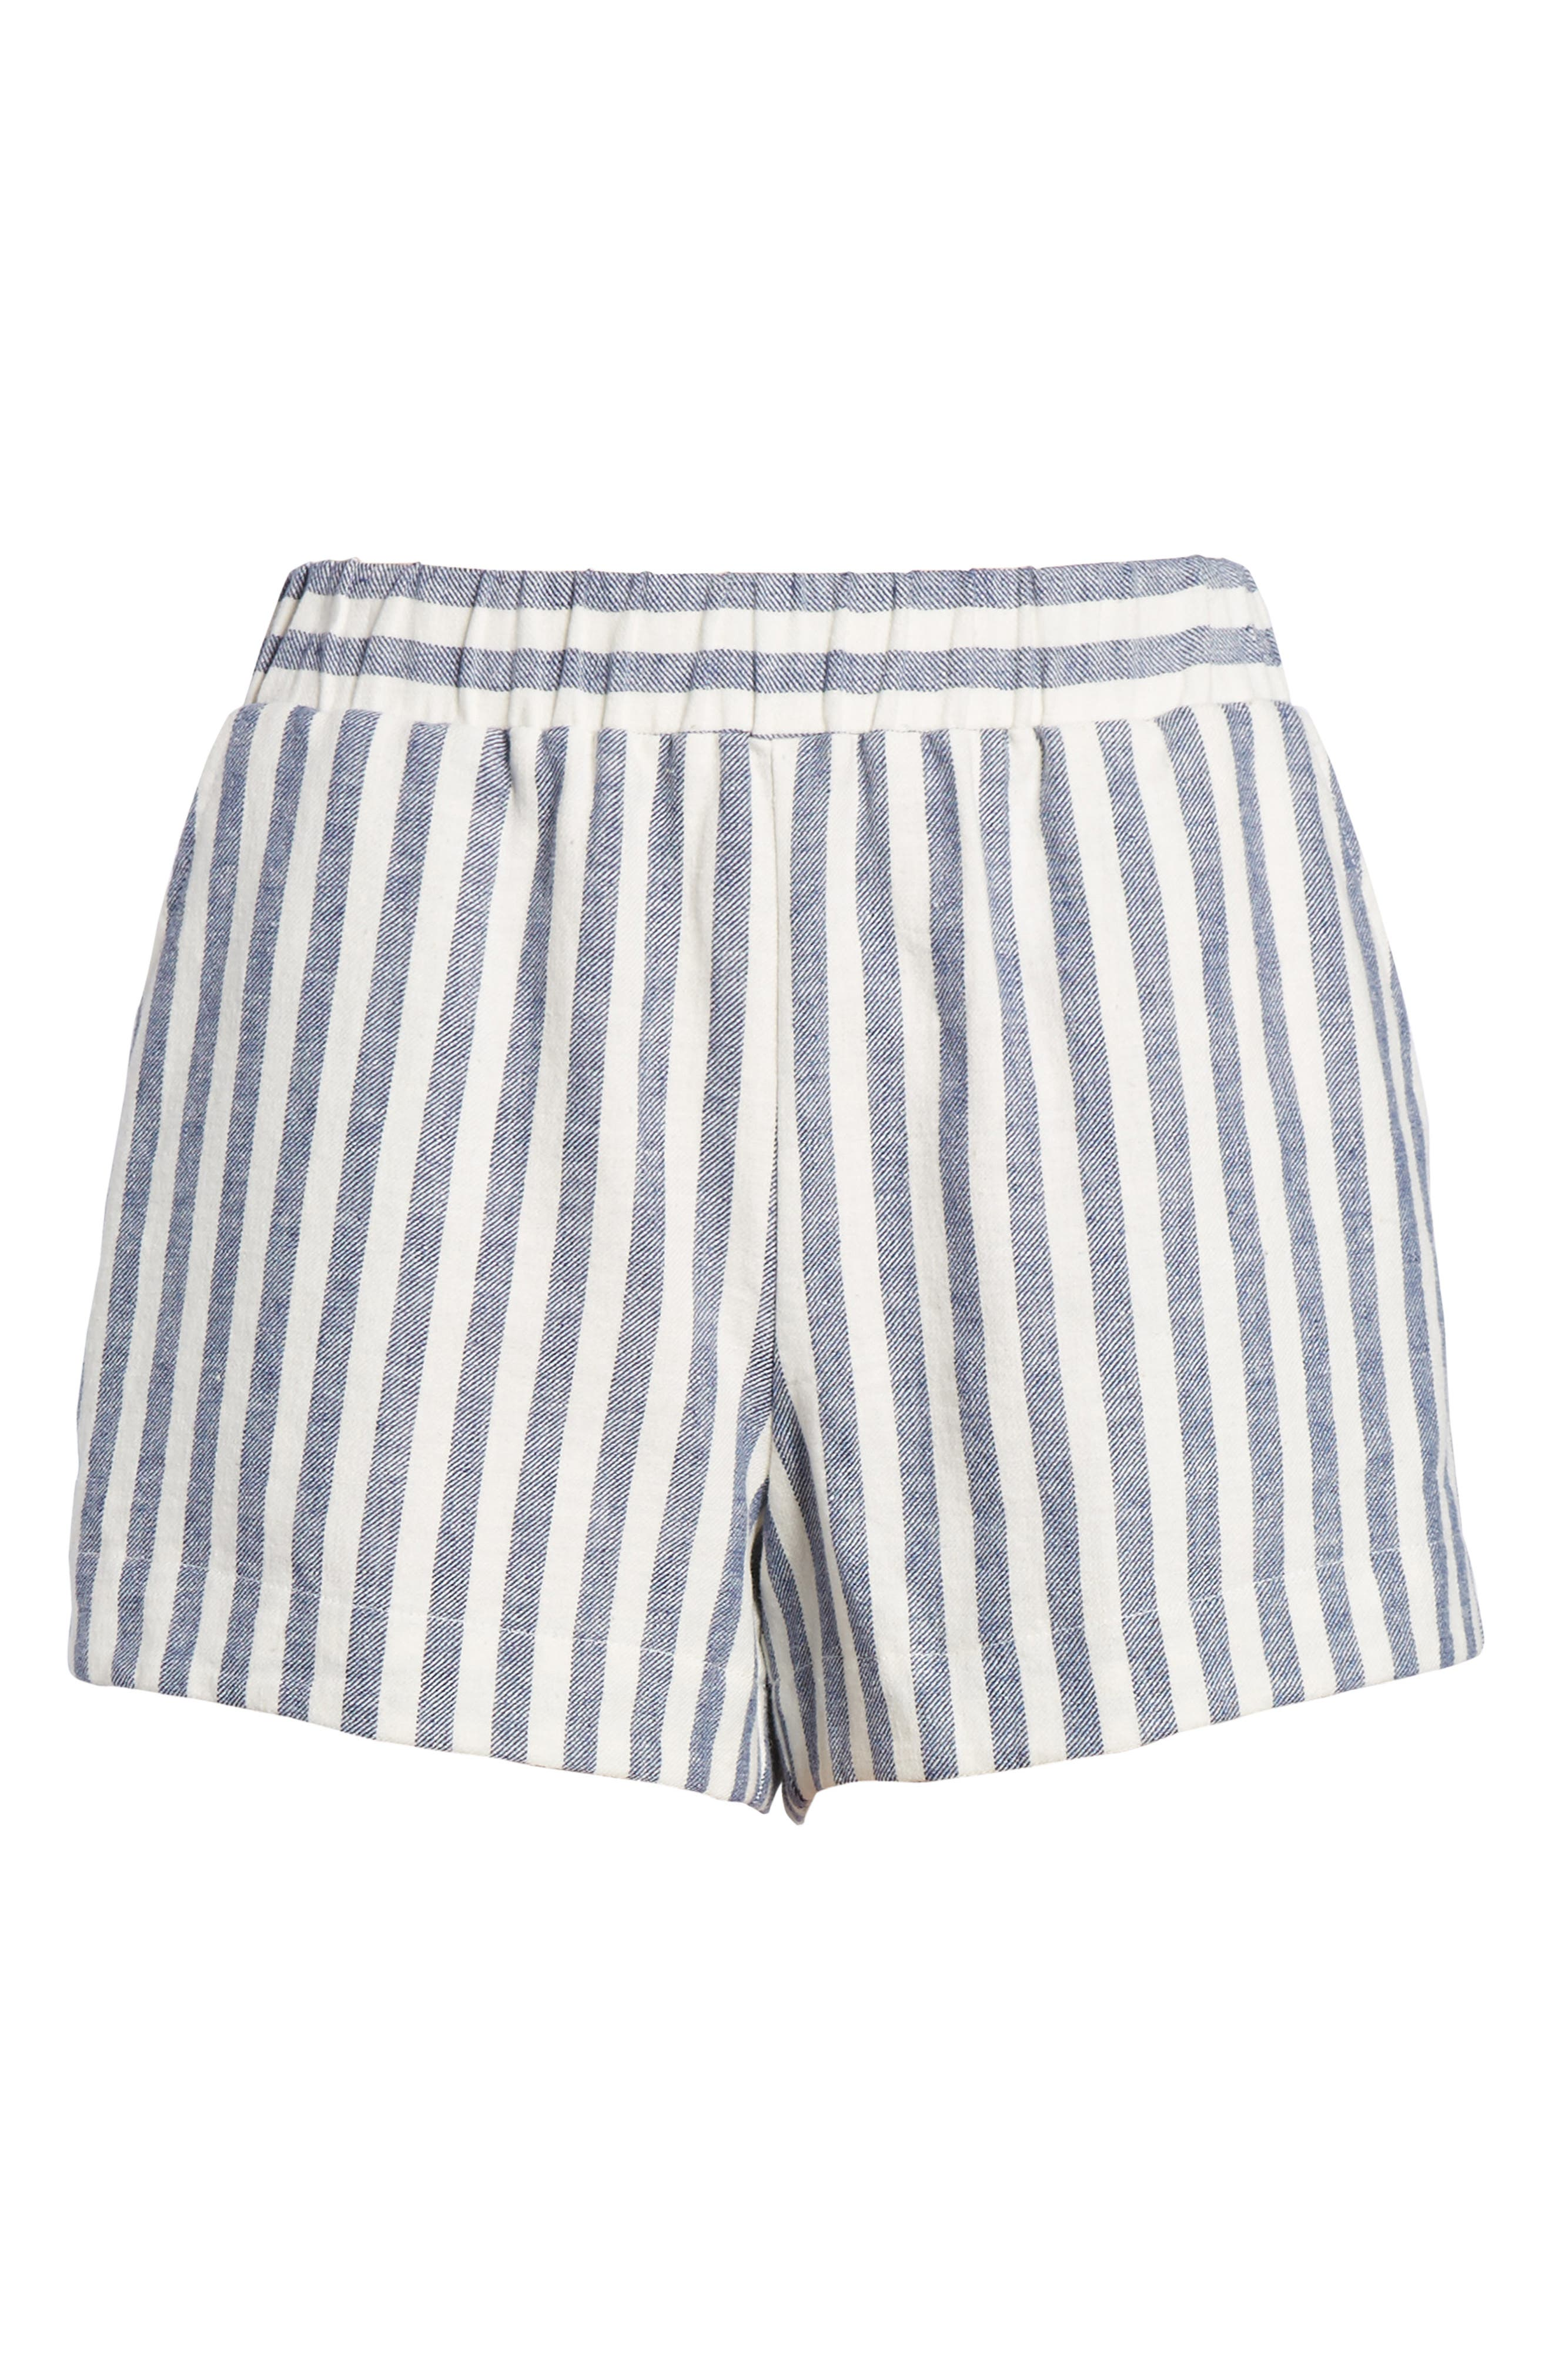 Stripe Linen Blend Shorts,                             Alternate thumbnail 6, color,                             903